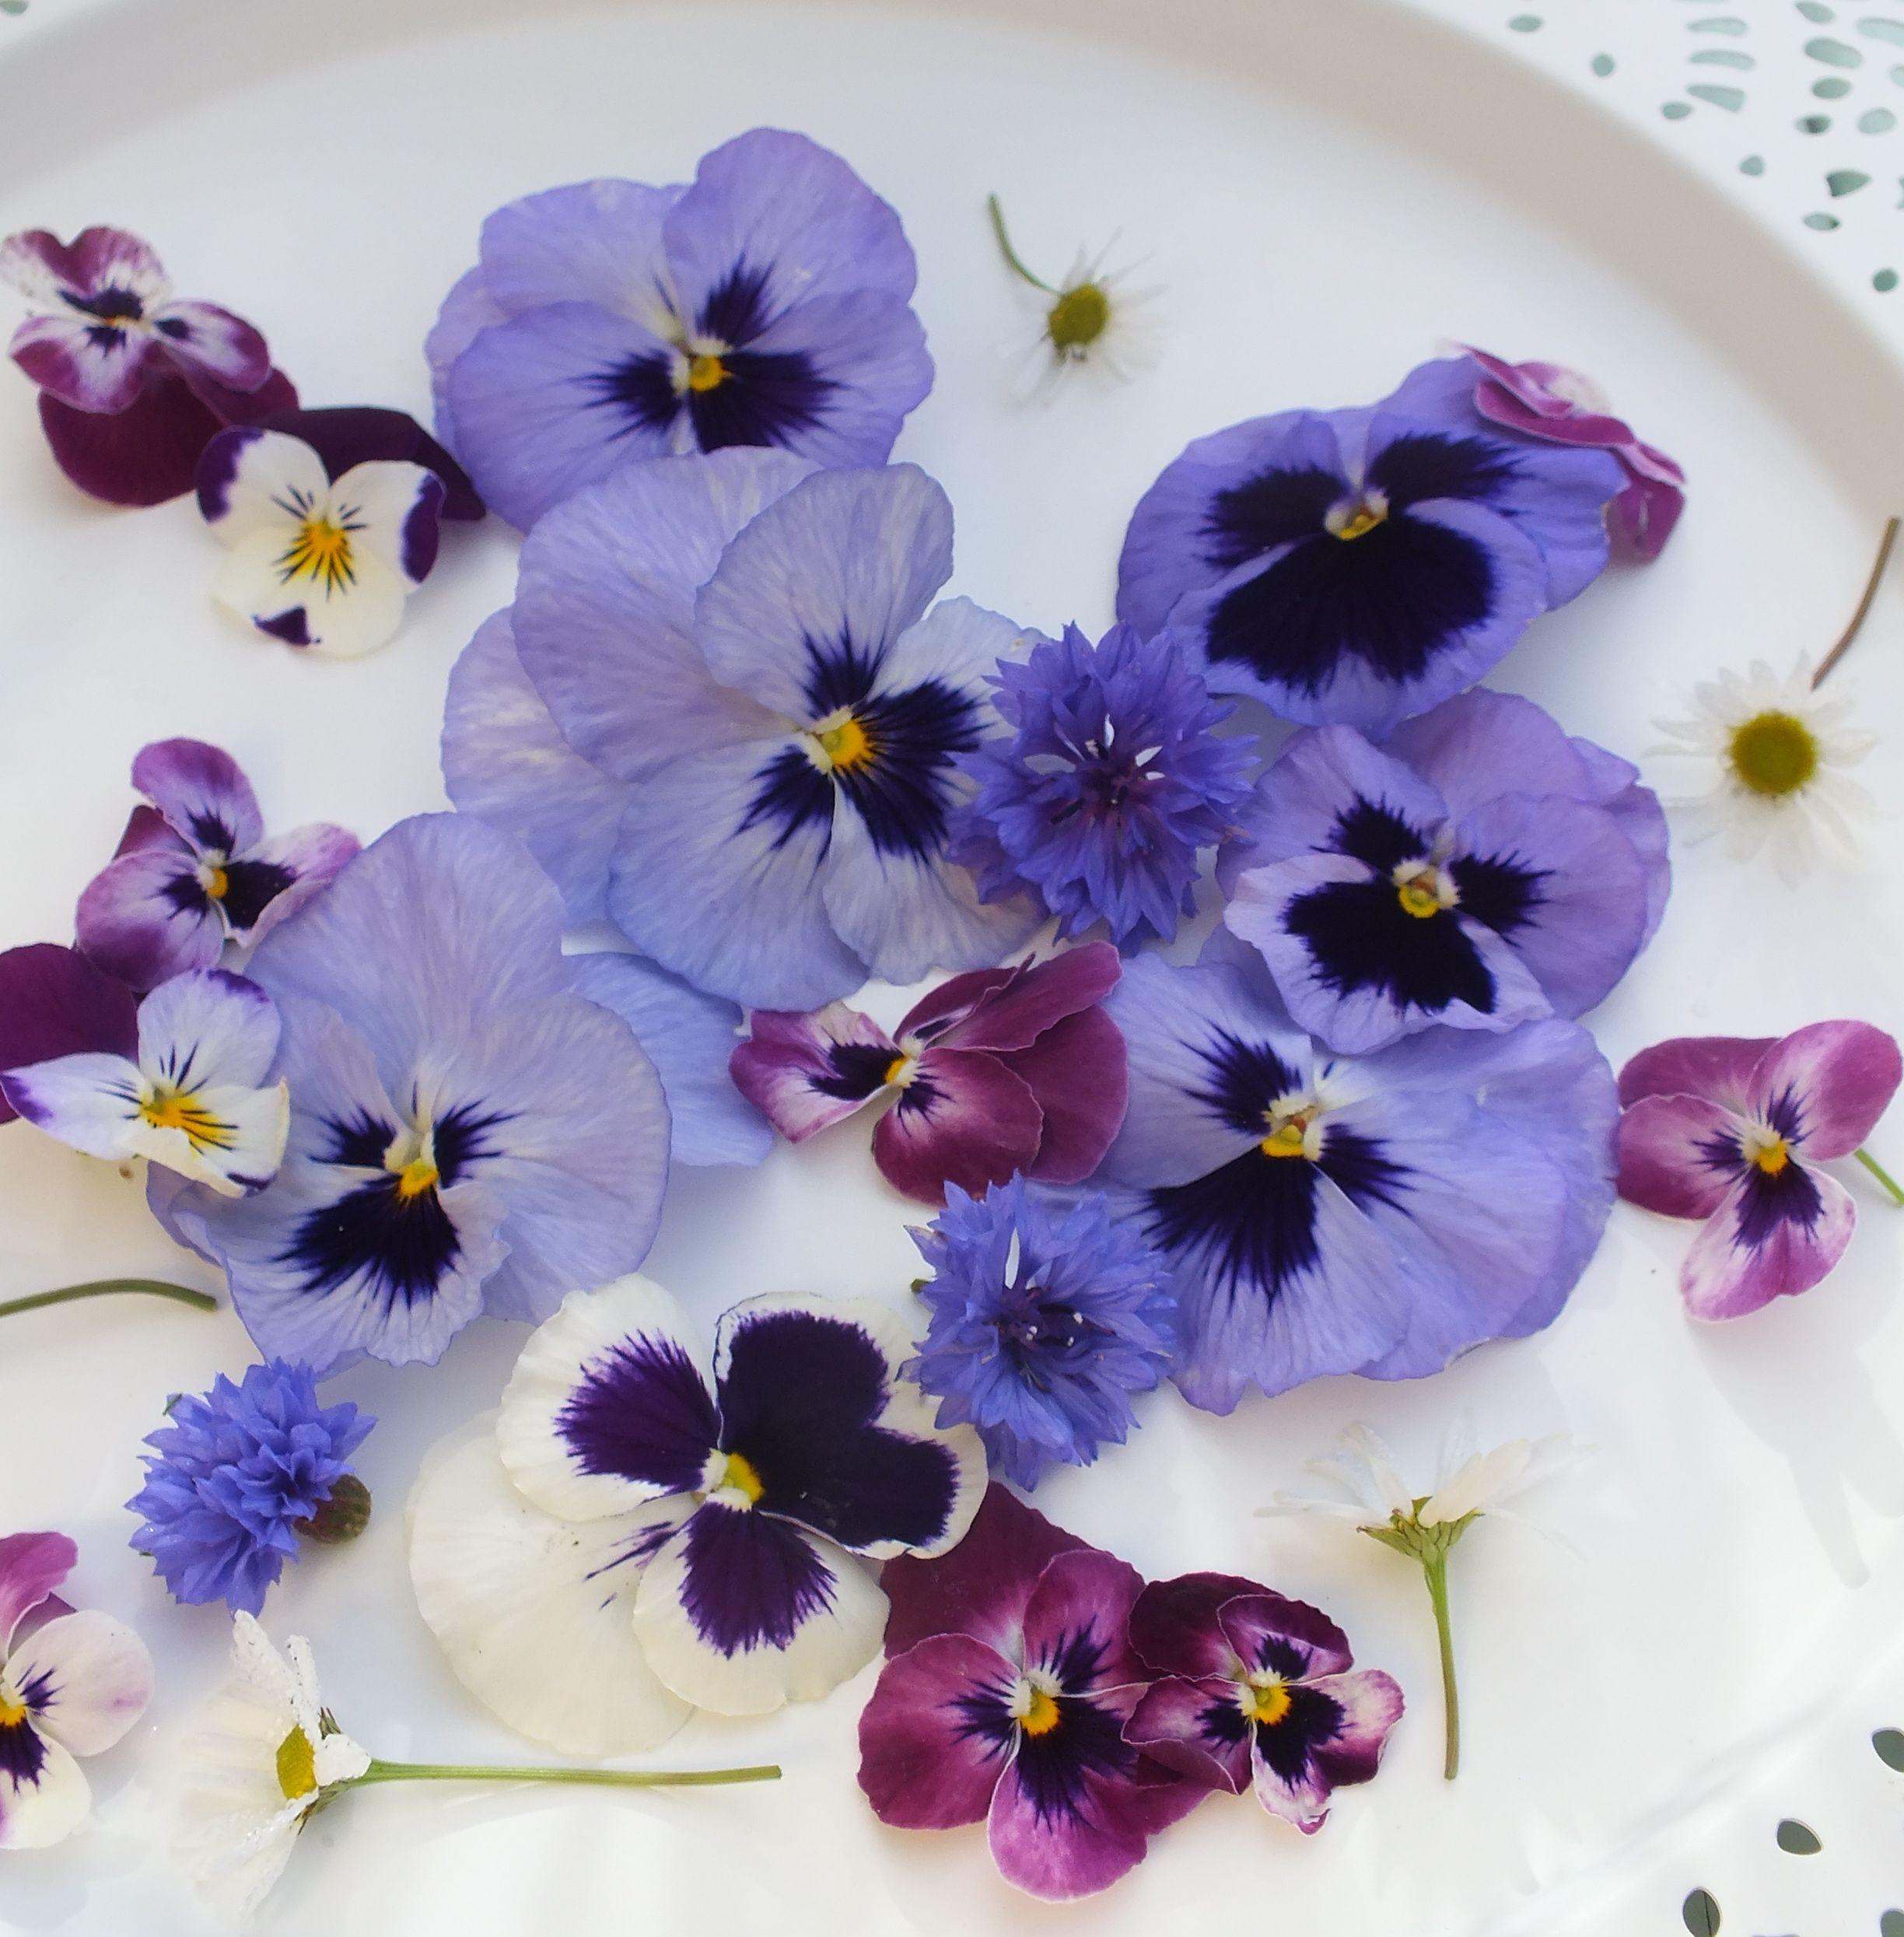 Pin By Wendalina Go On Violas Pansies Maddocks Farm Organics Growing Using Organic Edible Flowers Edible Flowers Pansies Flowers